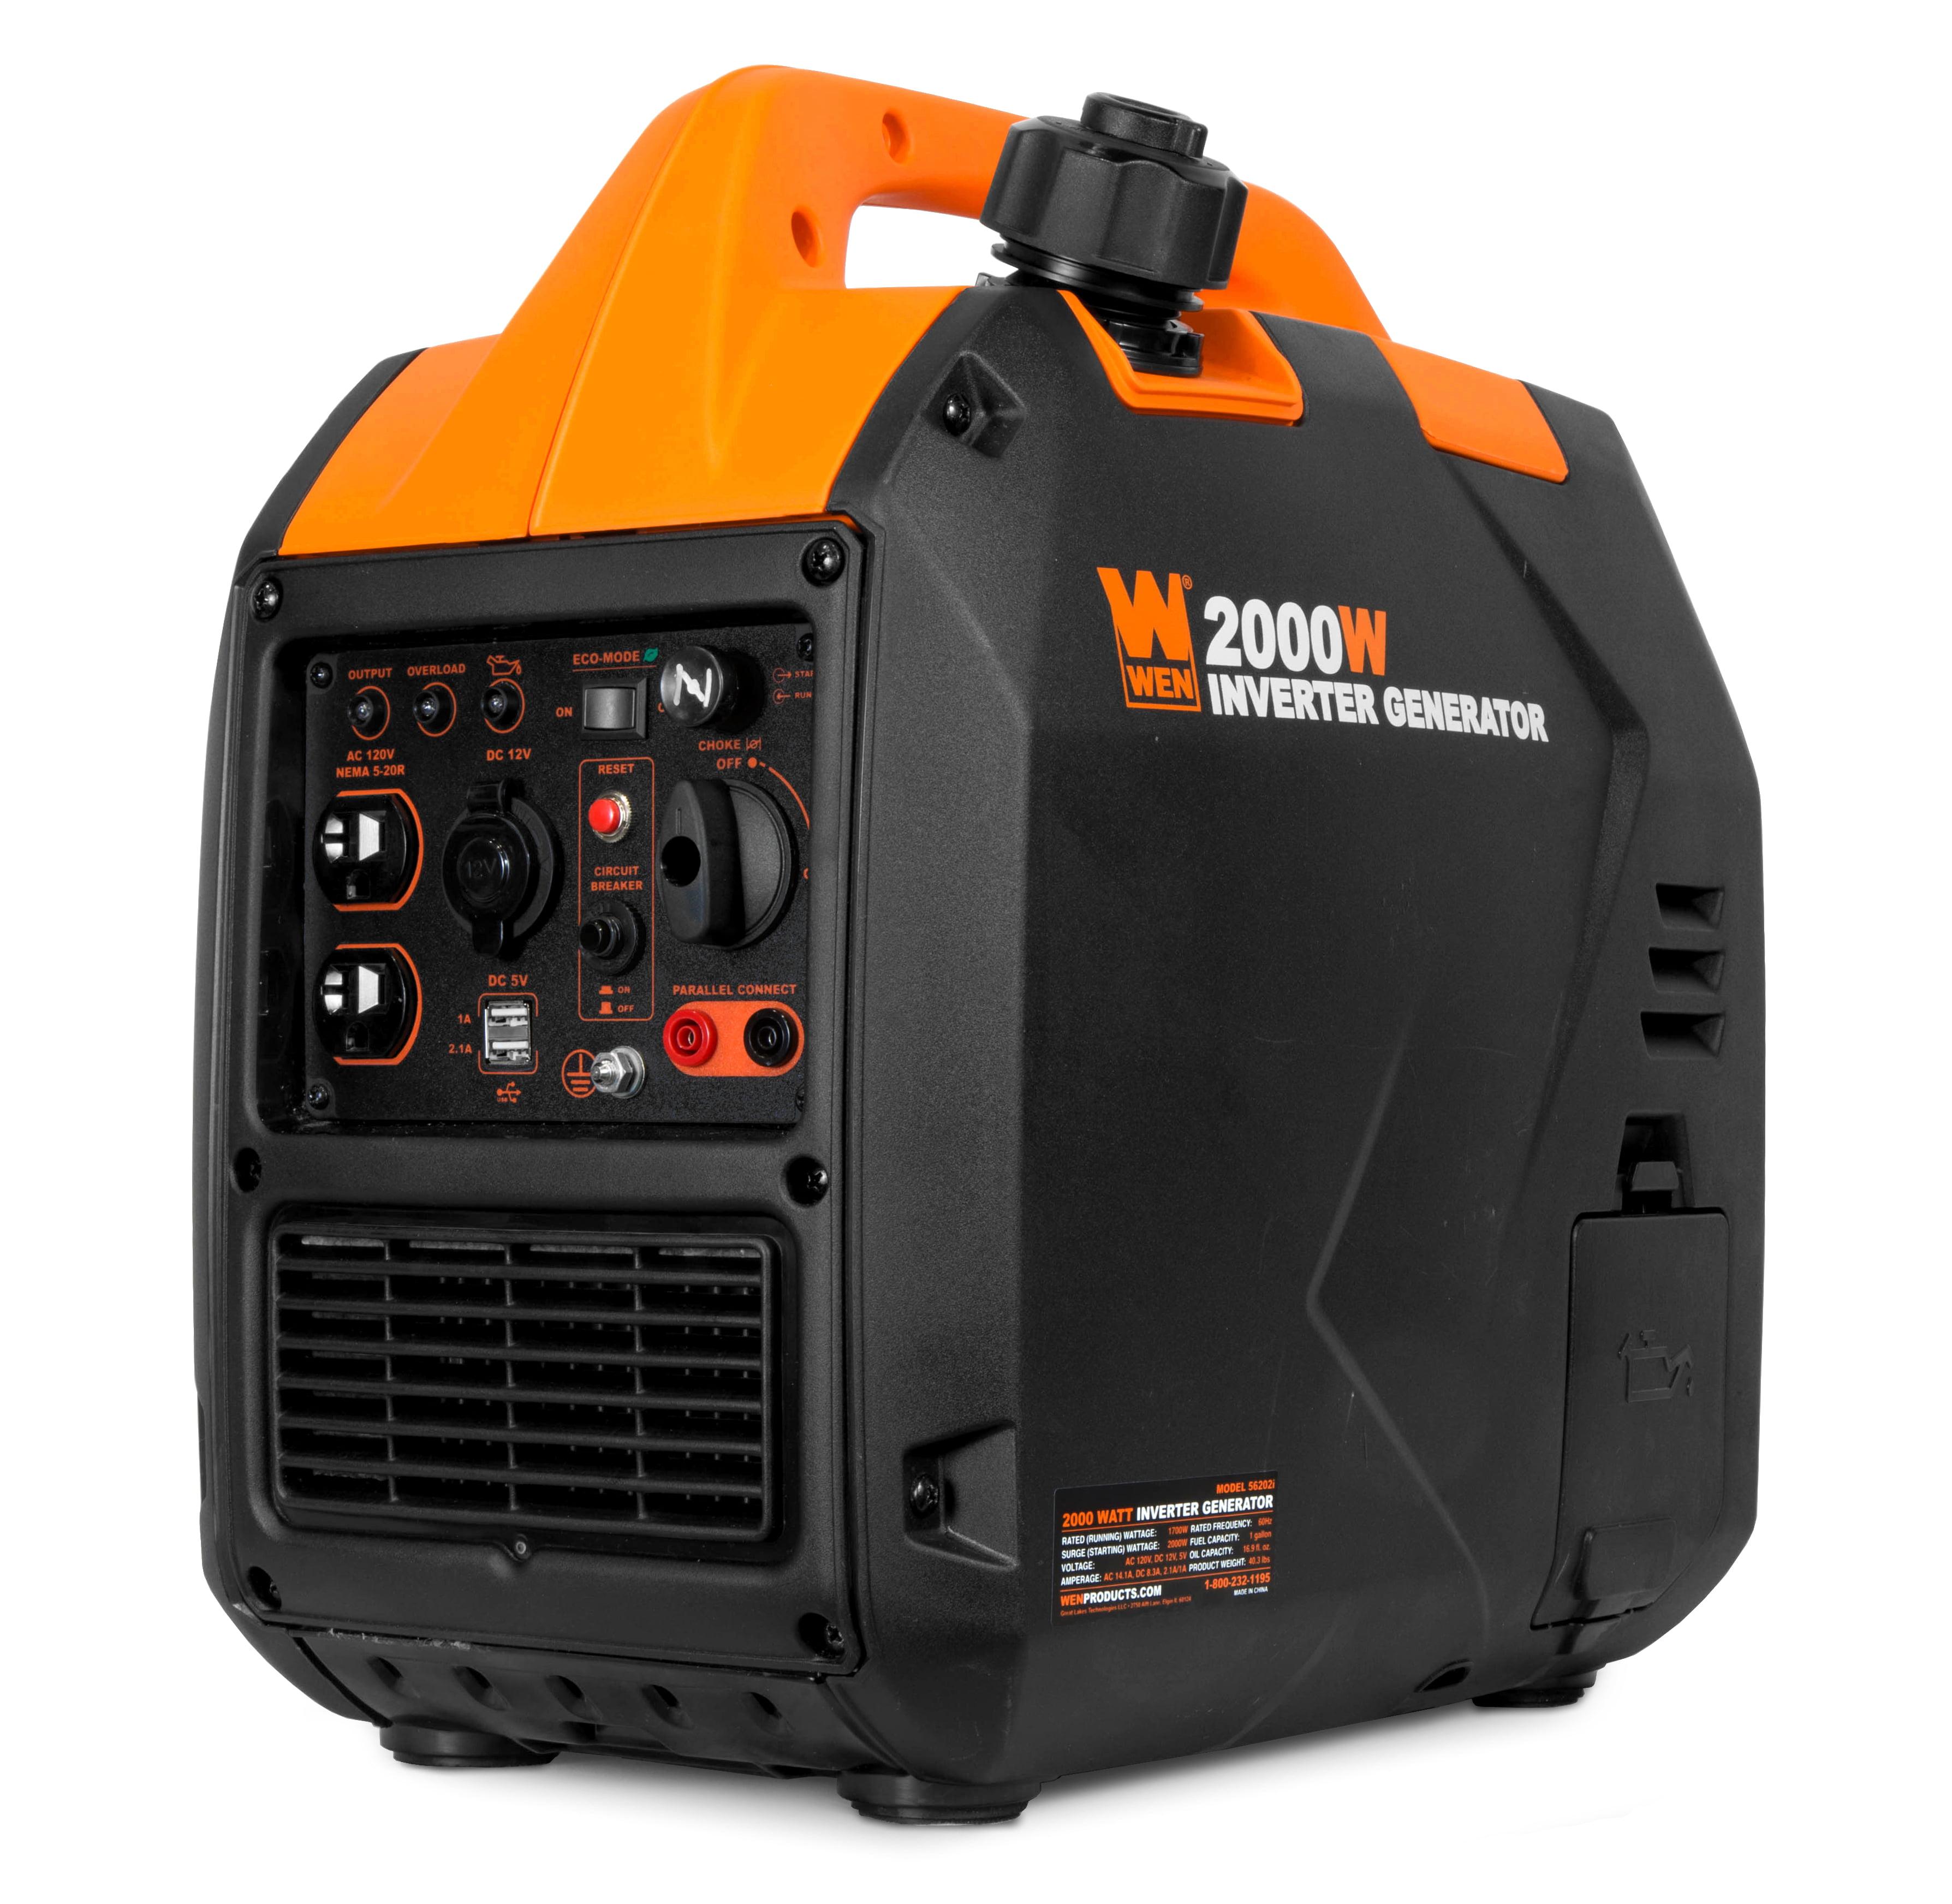 WEN Super Quiet 2000-Watt Portable Inverter Generator, CARB Compliant